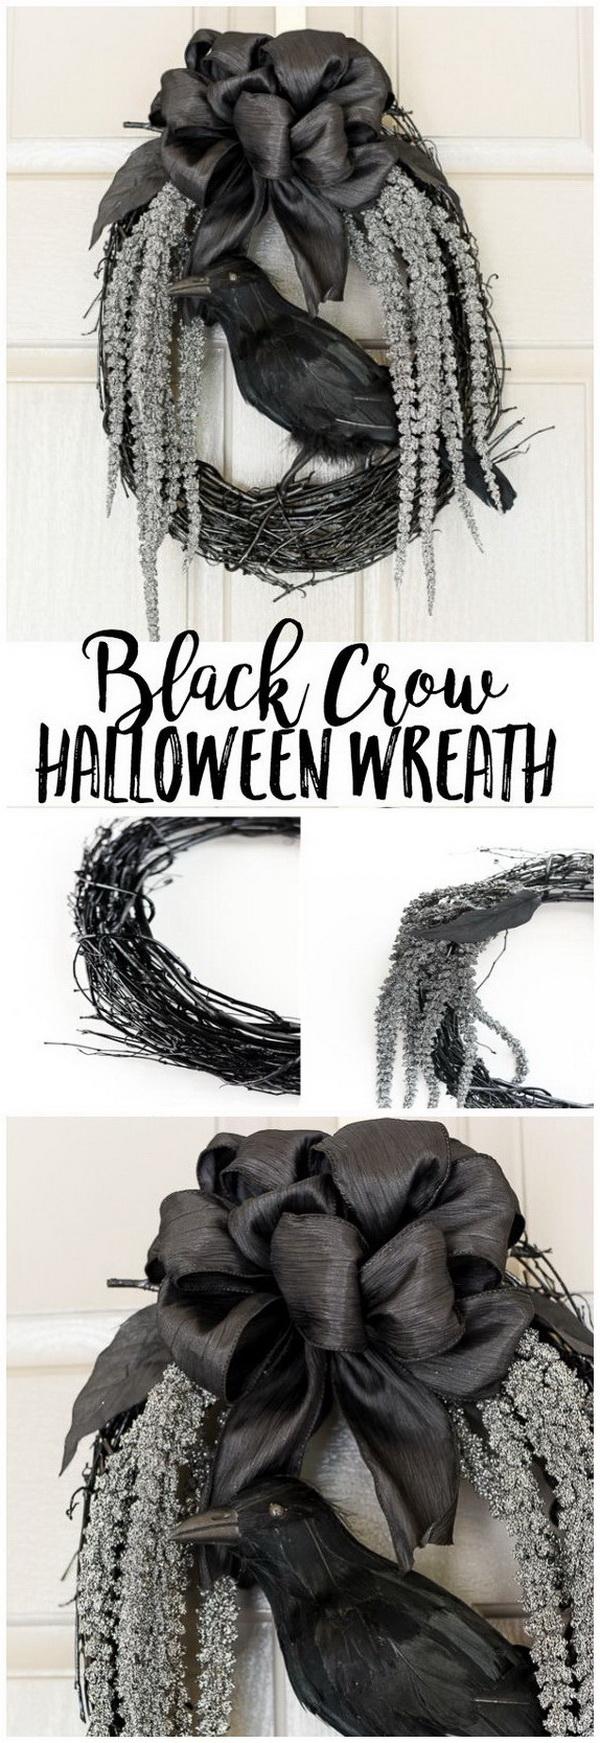 DIY Halloween Decorating Projects: DIY Black Crow Halloween Wreath.